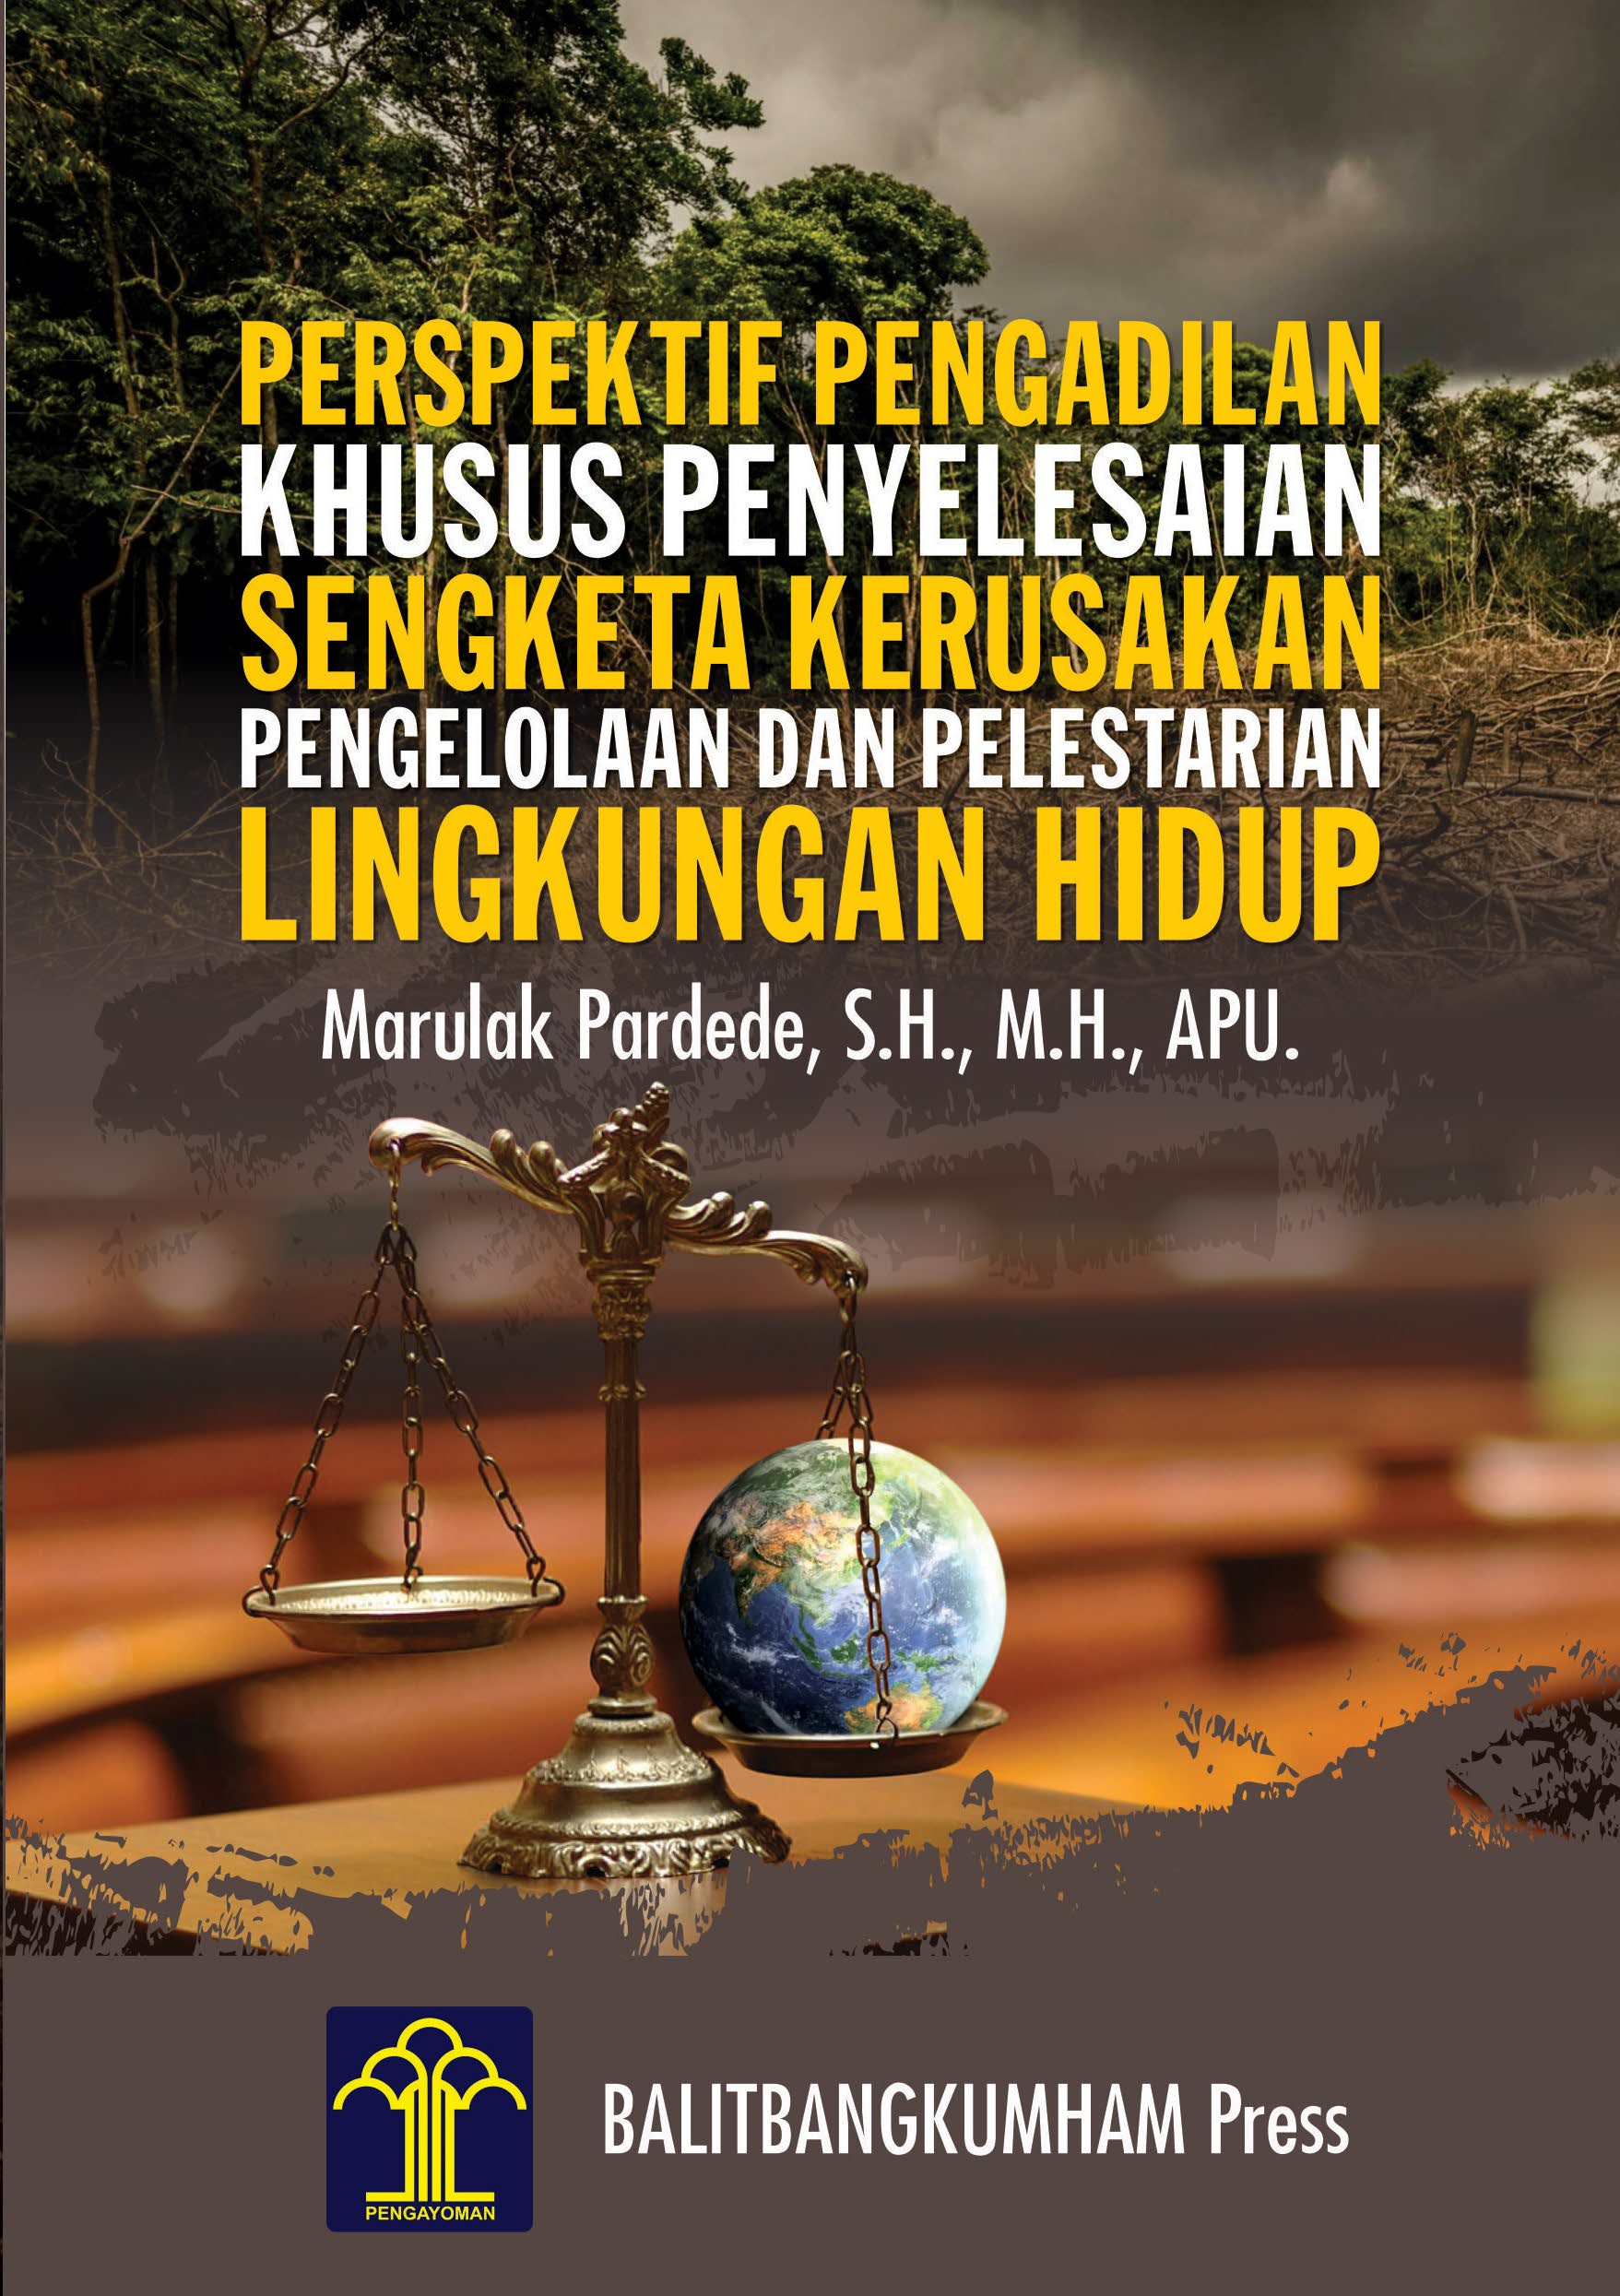 Perspektif Pengadilan Khusus Penyelesaian Sengketa Kerusakan Pengelolaan dan Pelestarian Lingkungan Hidup